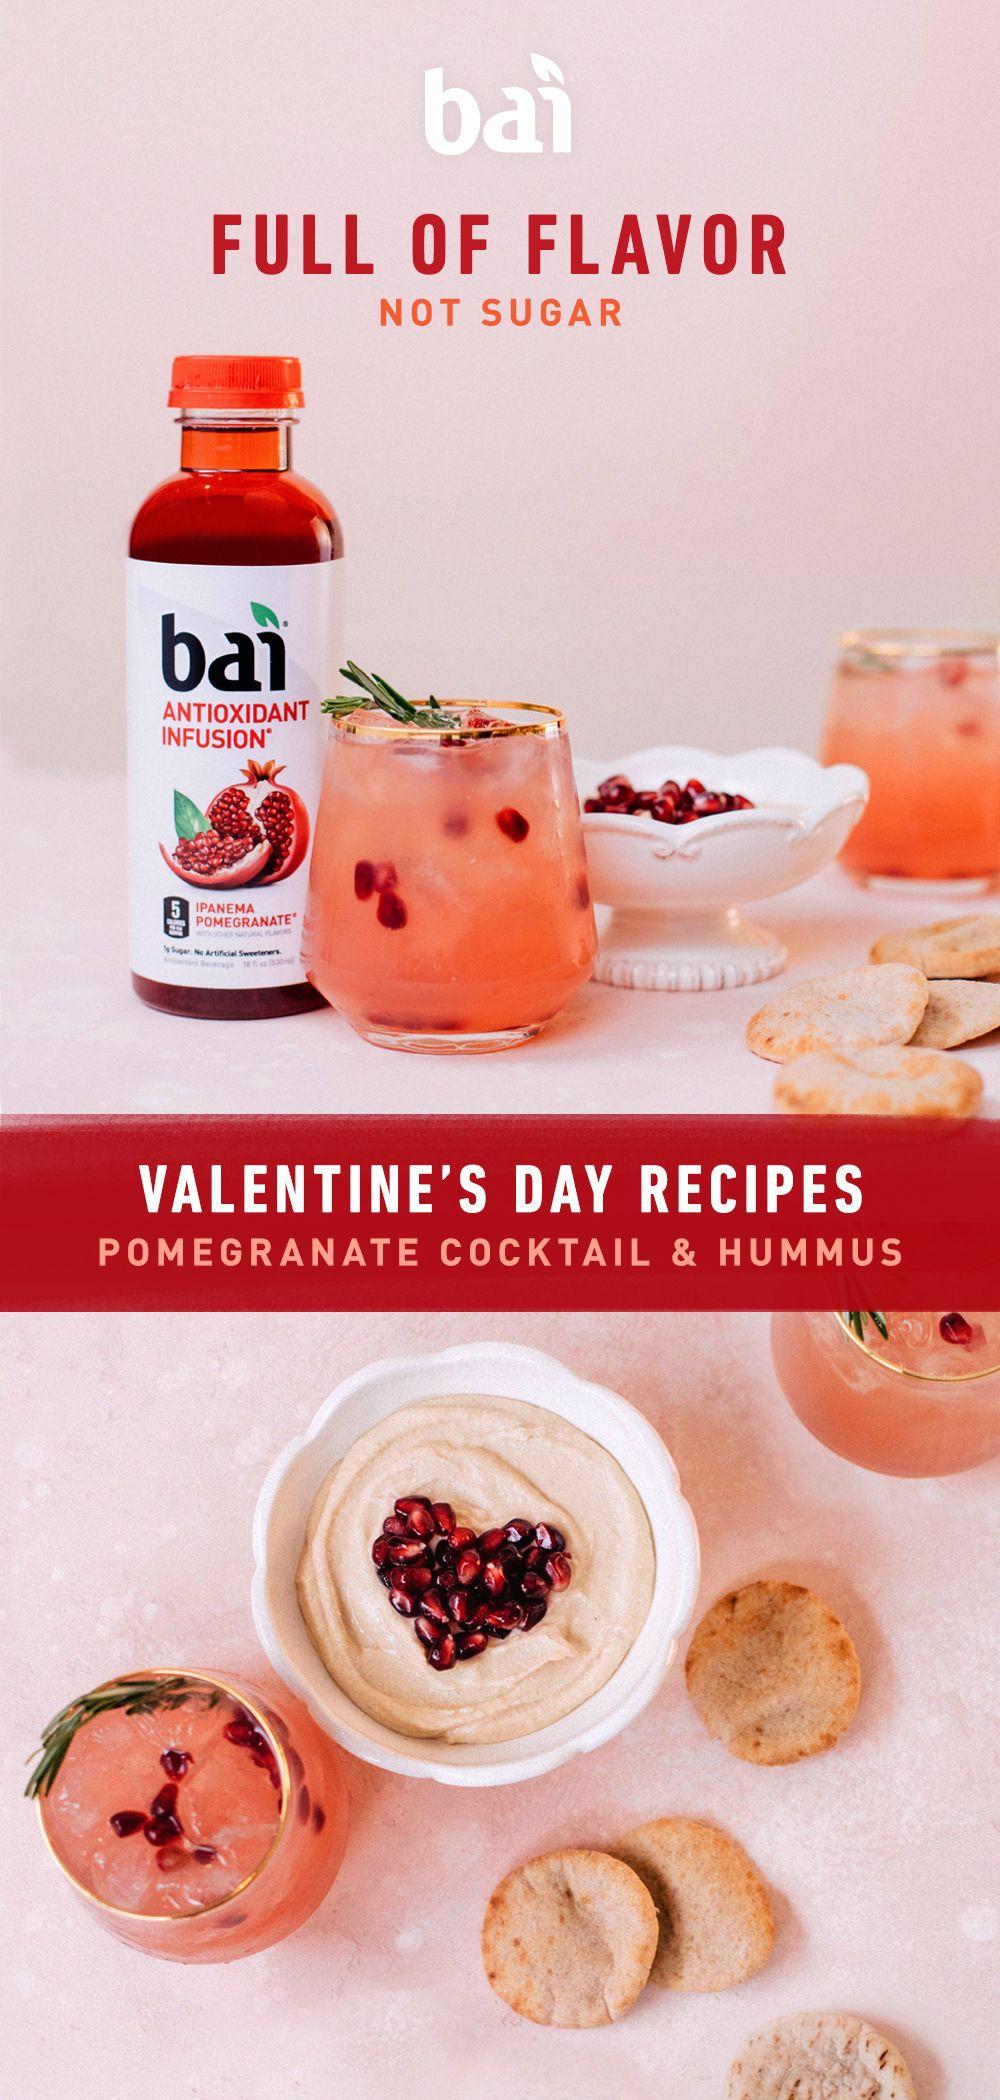 Bai Valentine S Day Recipes In 2020 Recipes Alcohol Recipes Food Processor Recipes